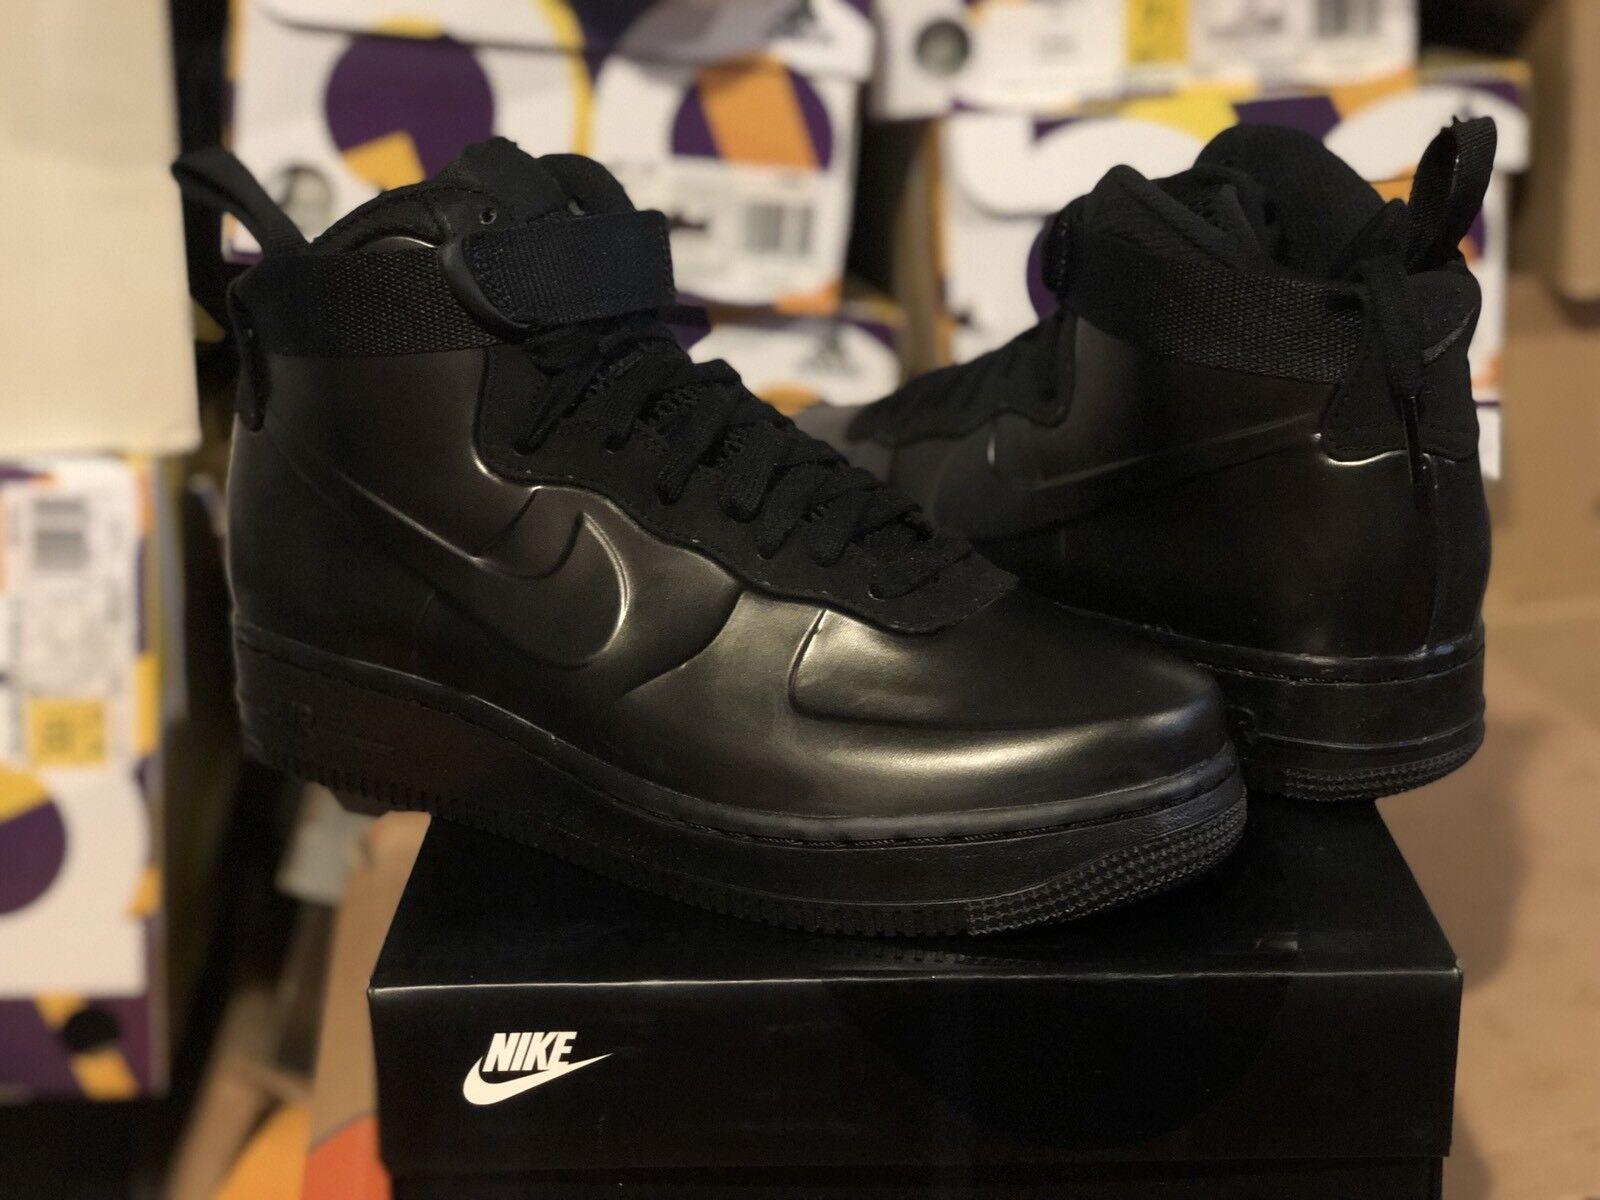 Uomo force air force Uomo 1 foamposite tazza scarpe f2d018